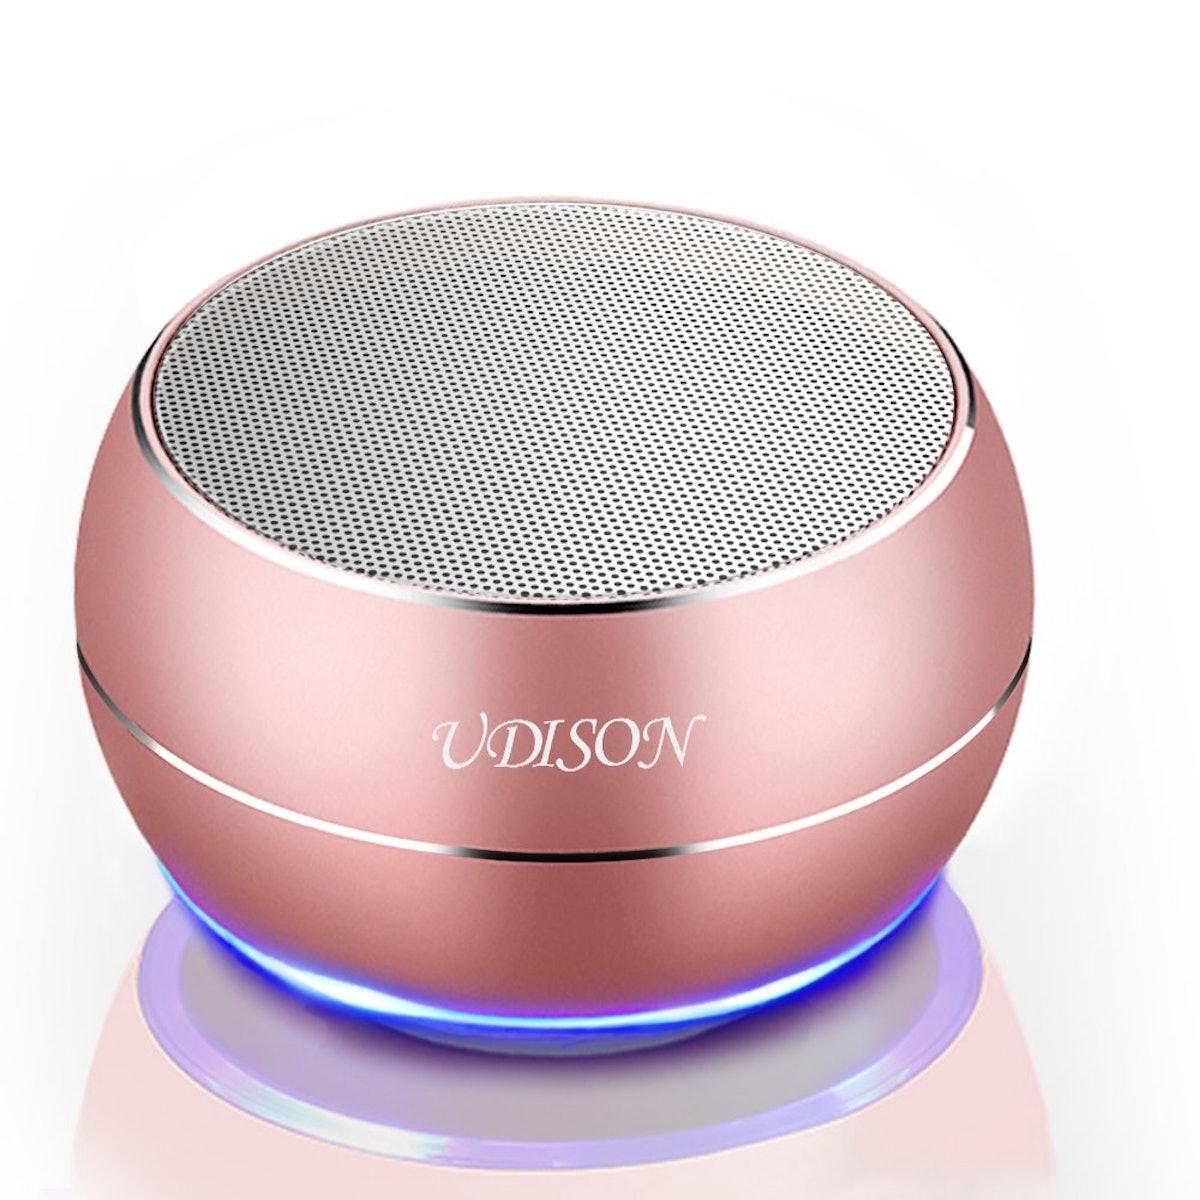 UDISON Mini Wireless Portable Bluetooth Speaker